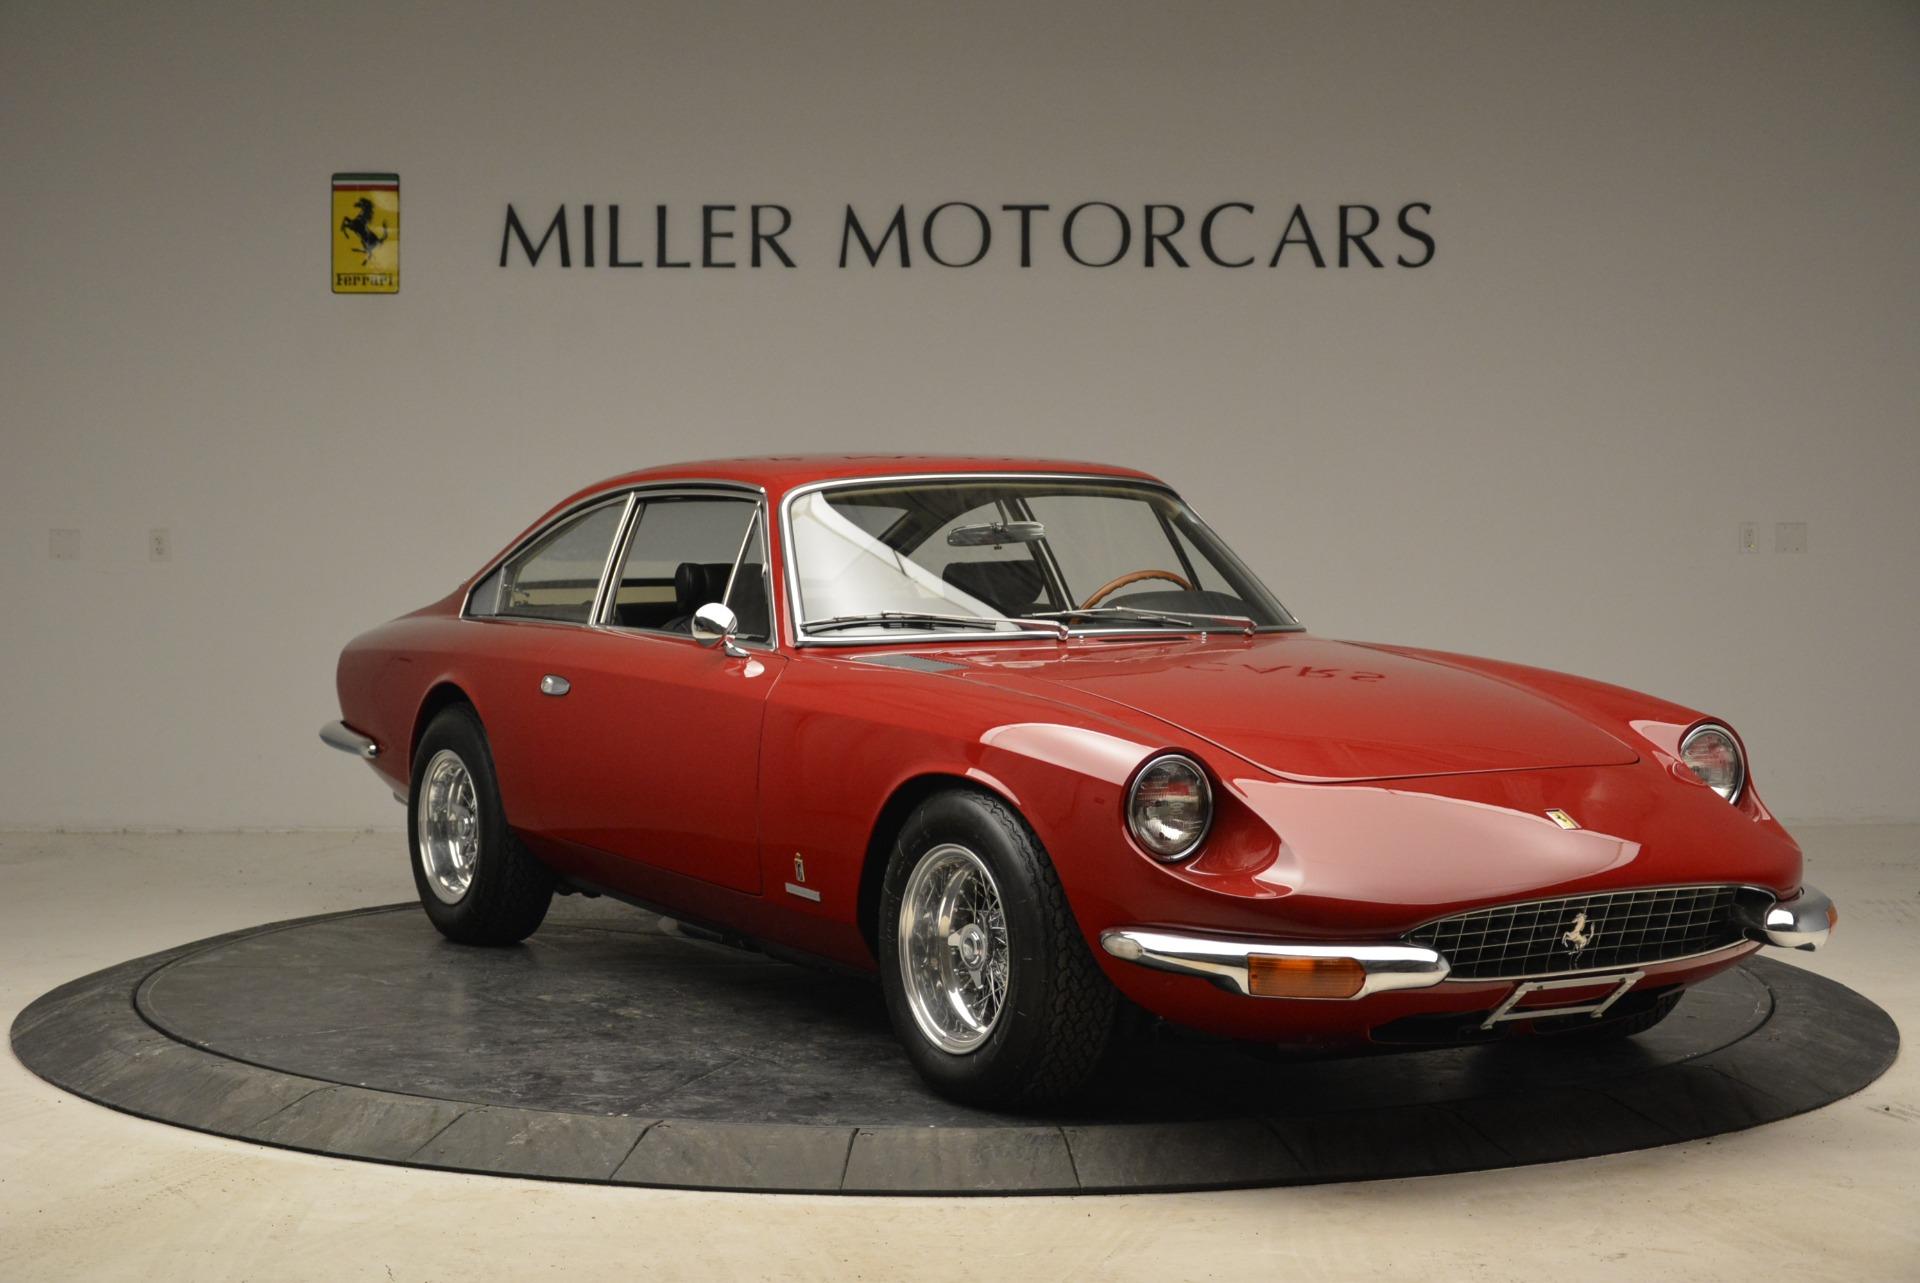 Used 1969 Ferrari 365 GT 2+2  For Sale In Greenwich, CT. Alfa Romeo of Greenwich, 4424 1995_p11